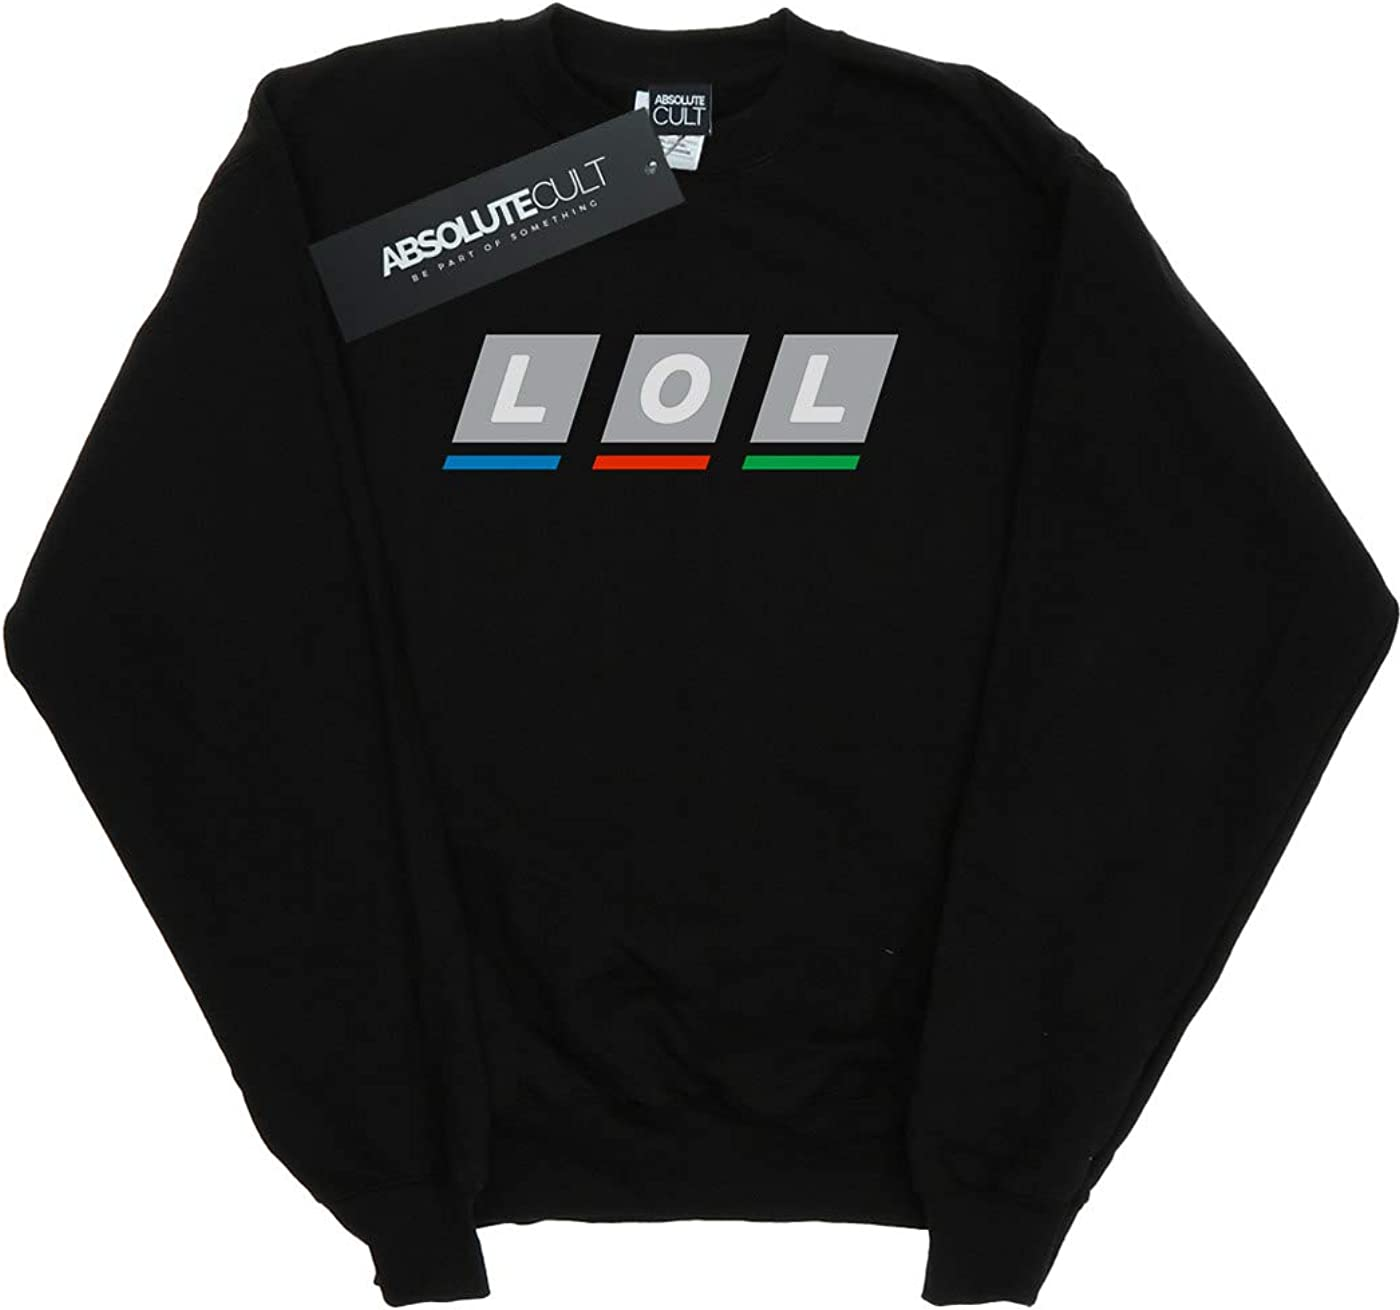 ABSOLUTECULT Drewbacca Girls LOL Broadcasting Sweatshirt